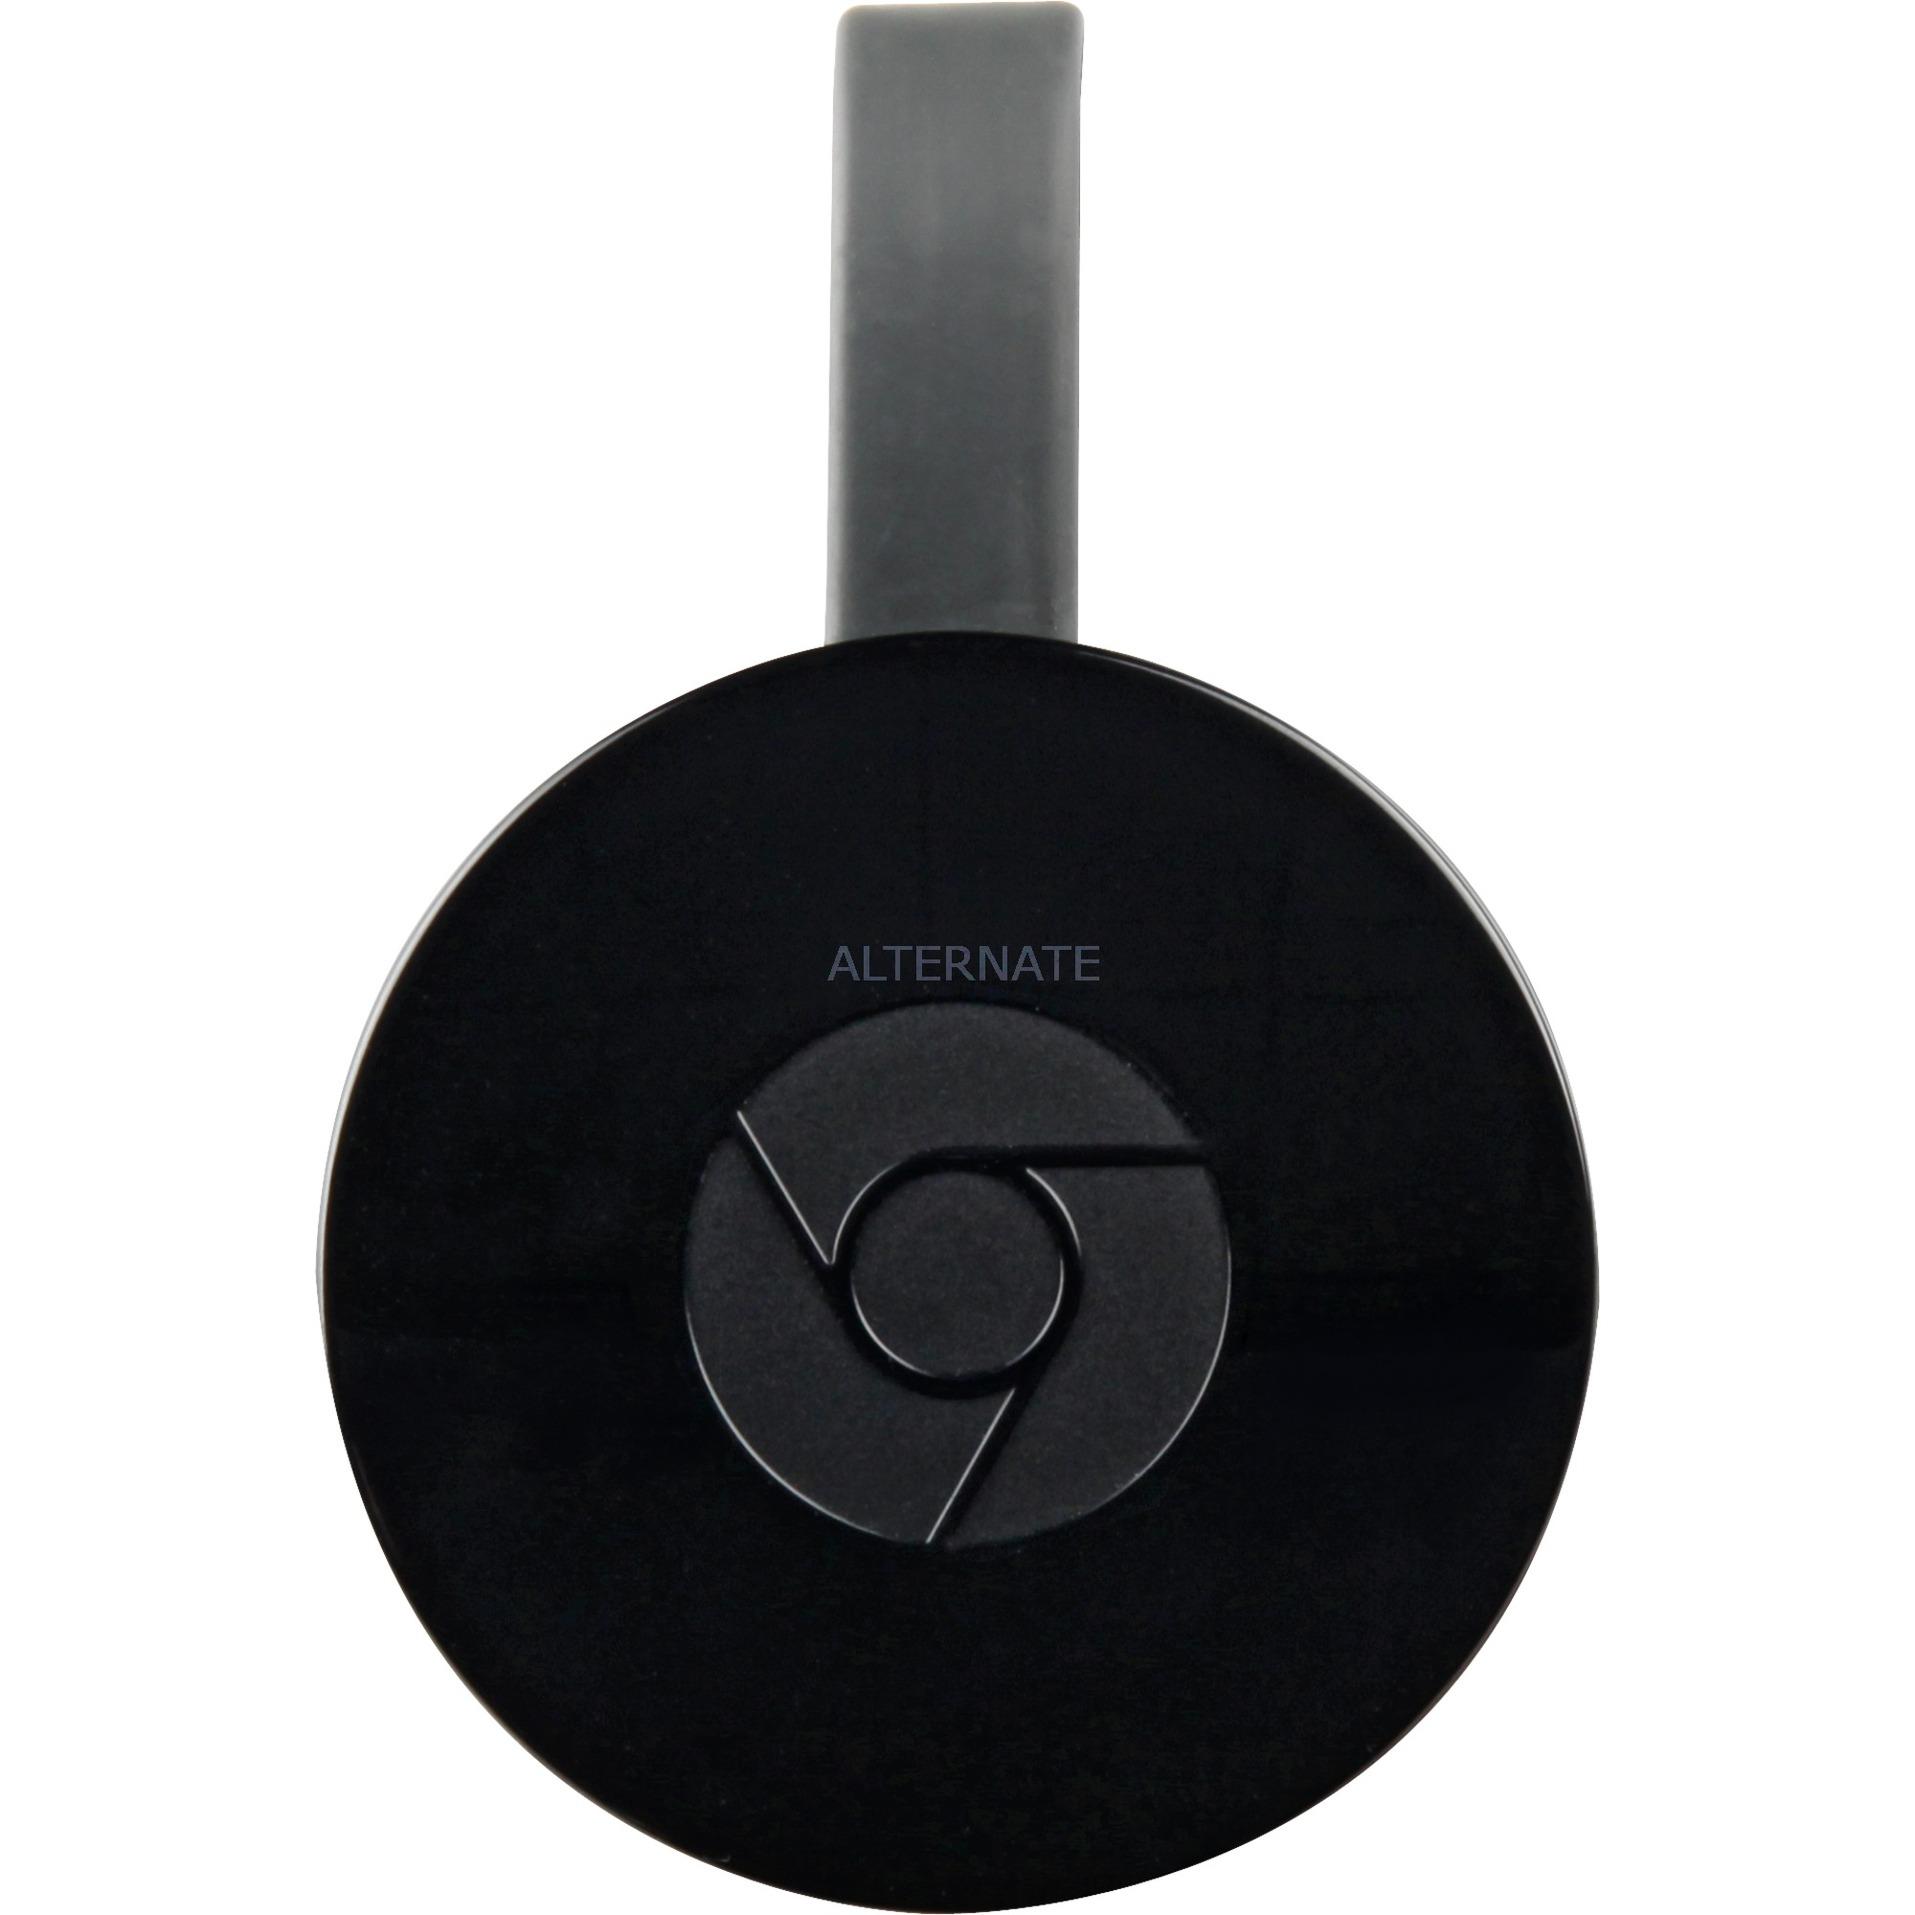 Chromecast 2015 dongle Smart TV Full HD HDMI Negro, Cliente streaming